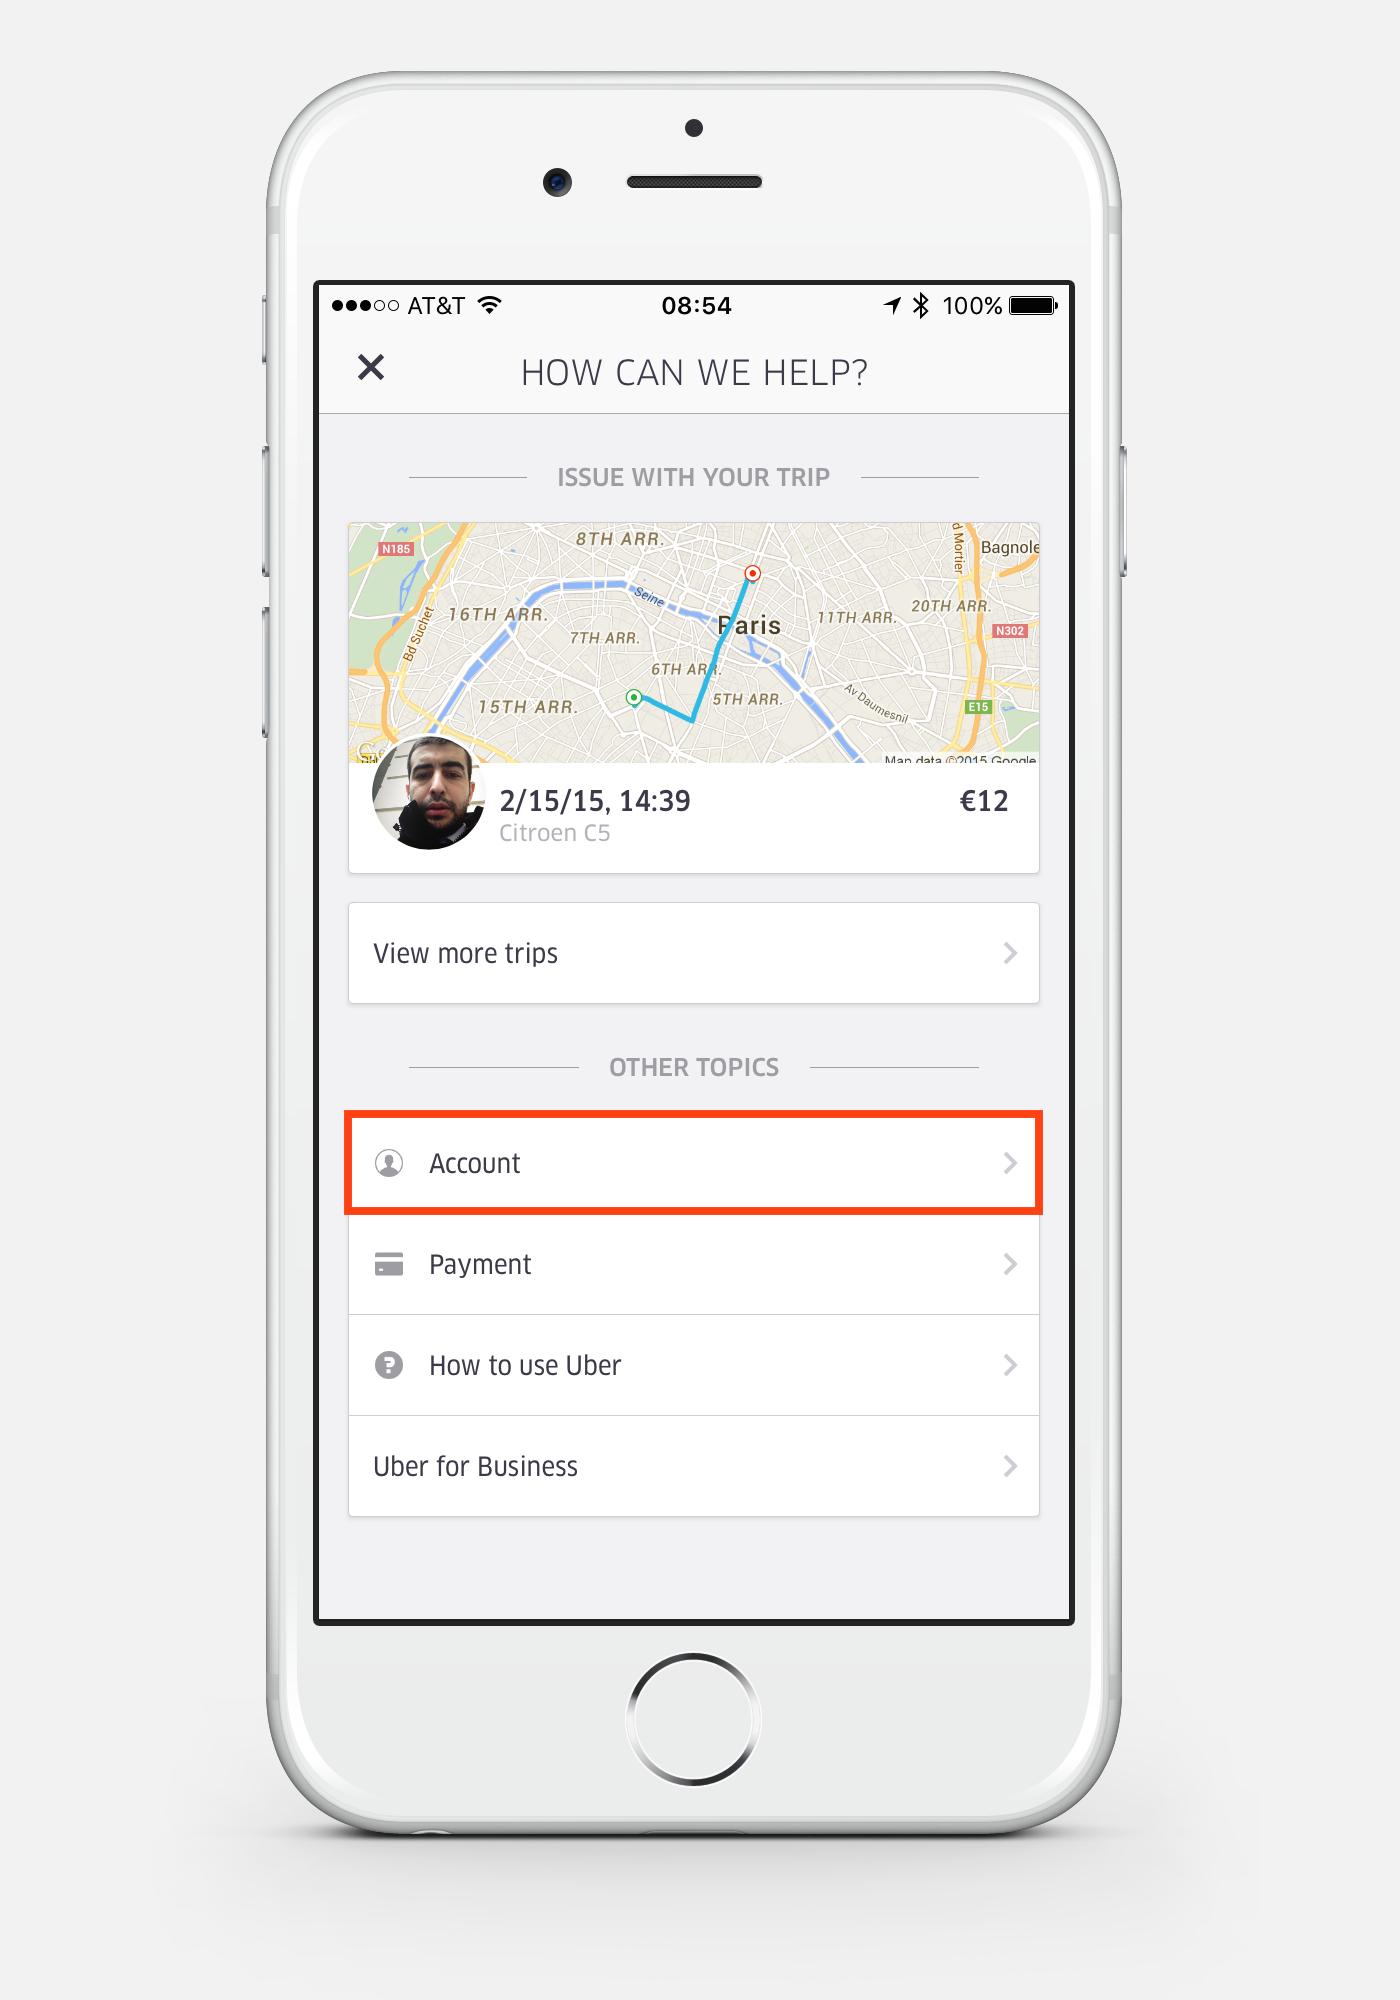 iPhone Uber App